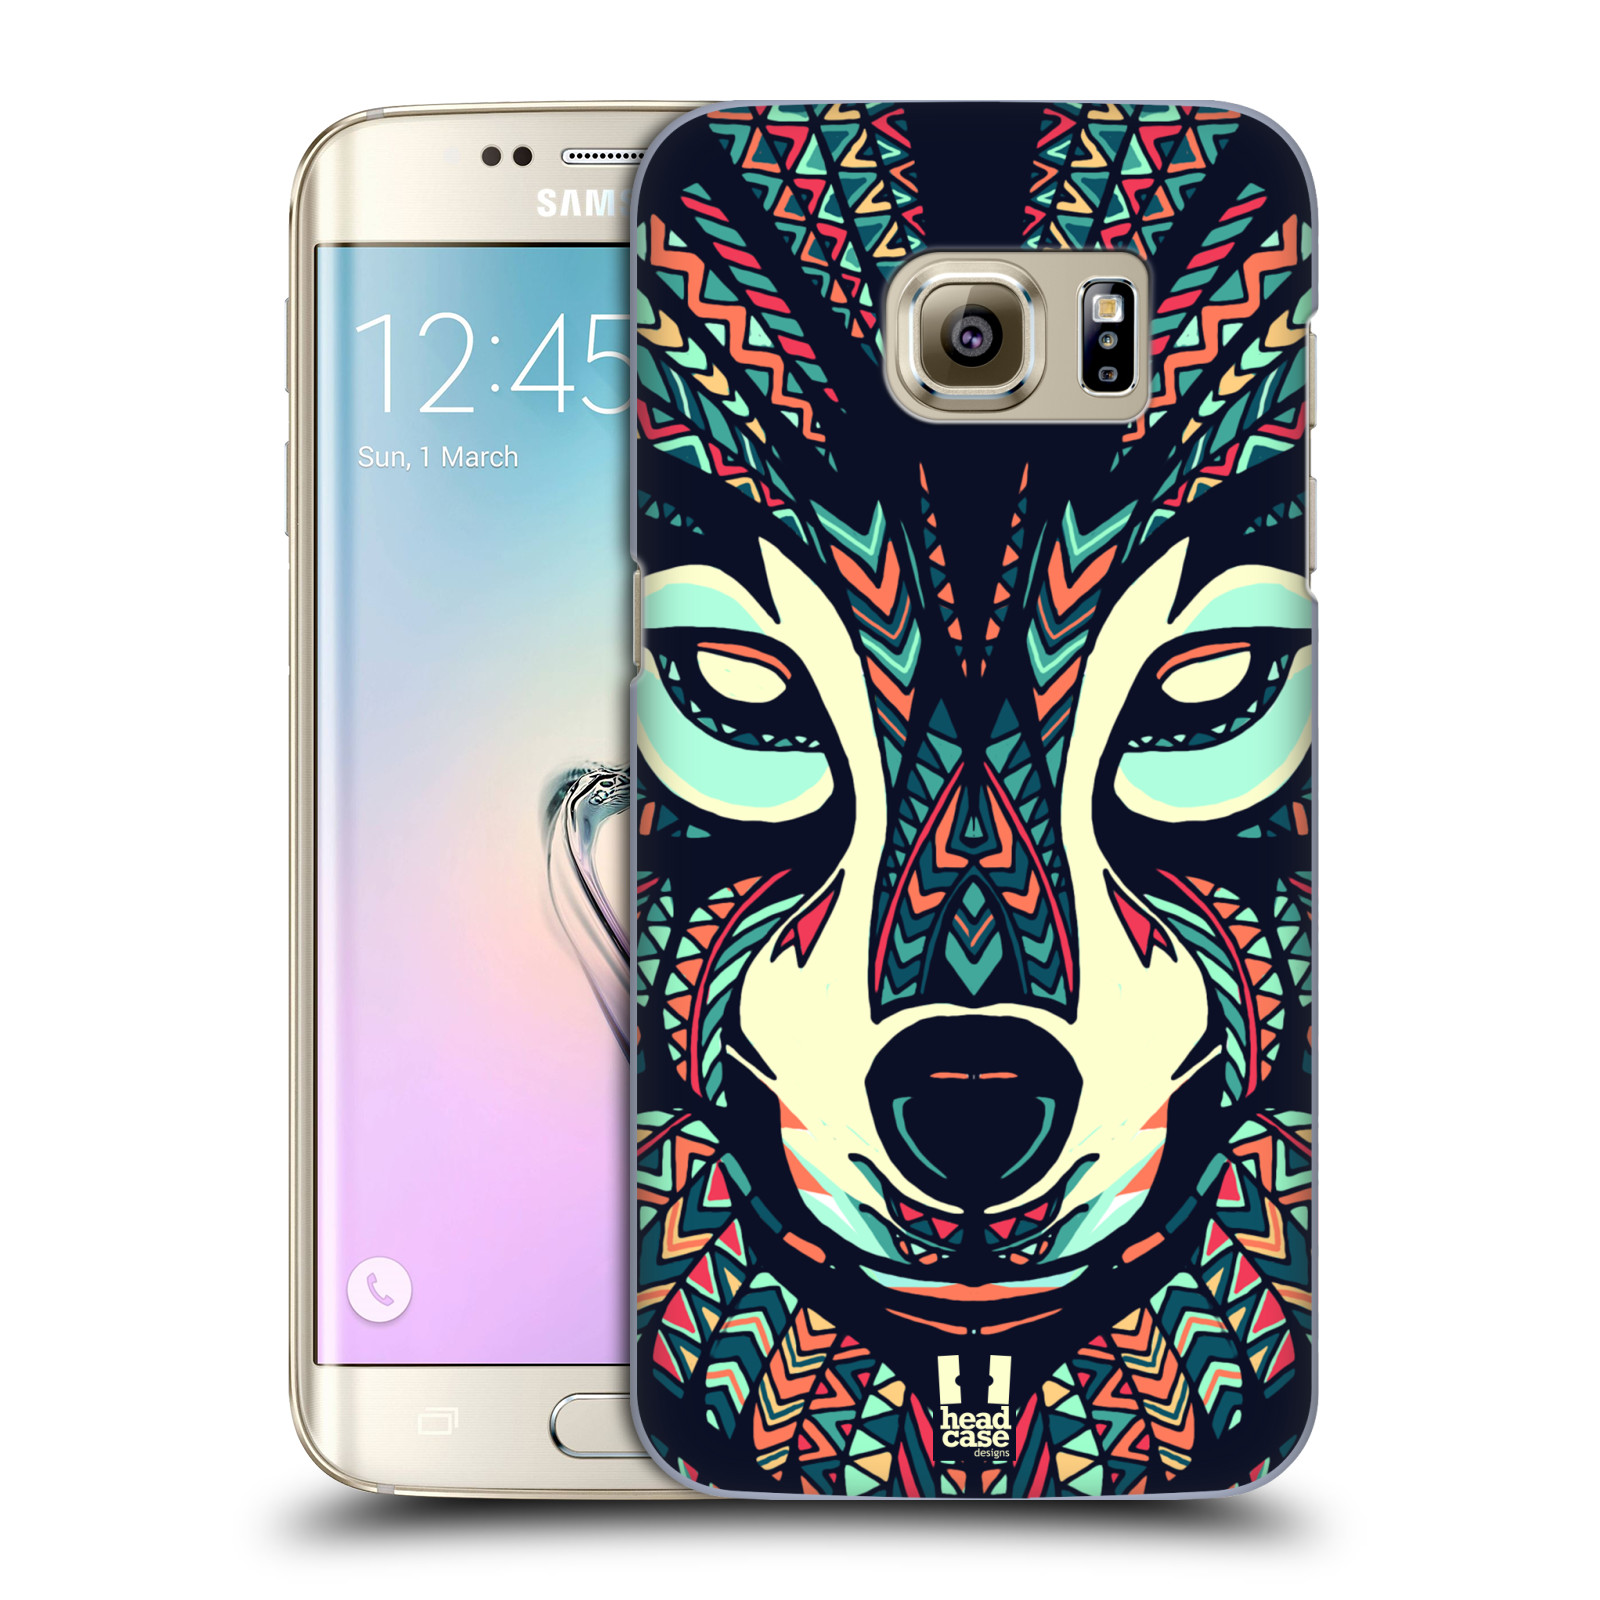 HEAD CASE plastový obal na mobil SAMSUNG GALAXY S7 EDGE vzor Aztécký motiv zvíře 3 vlk